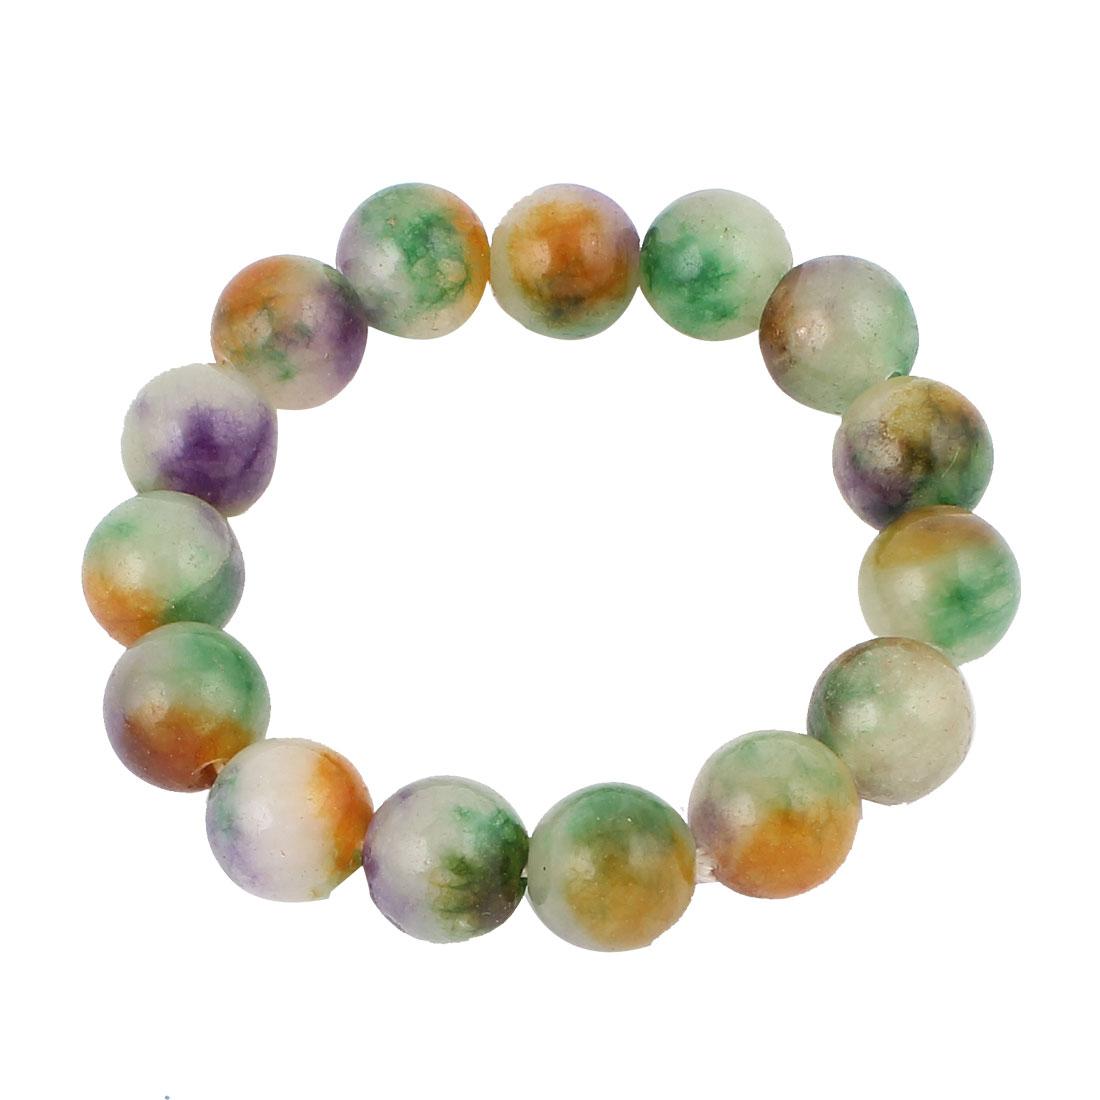 Women Jewelry Faux Jade Decor Elastic Wrist Stretchy Bangle Bracelet Colorful